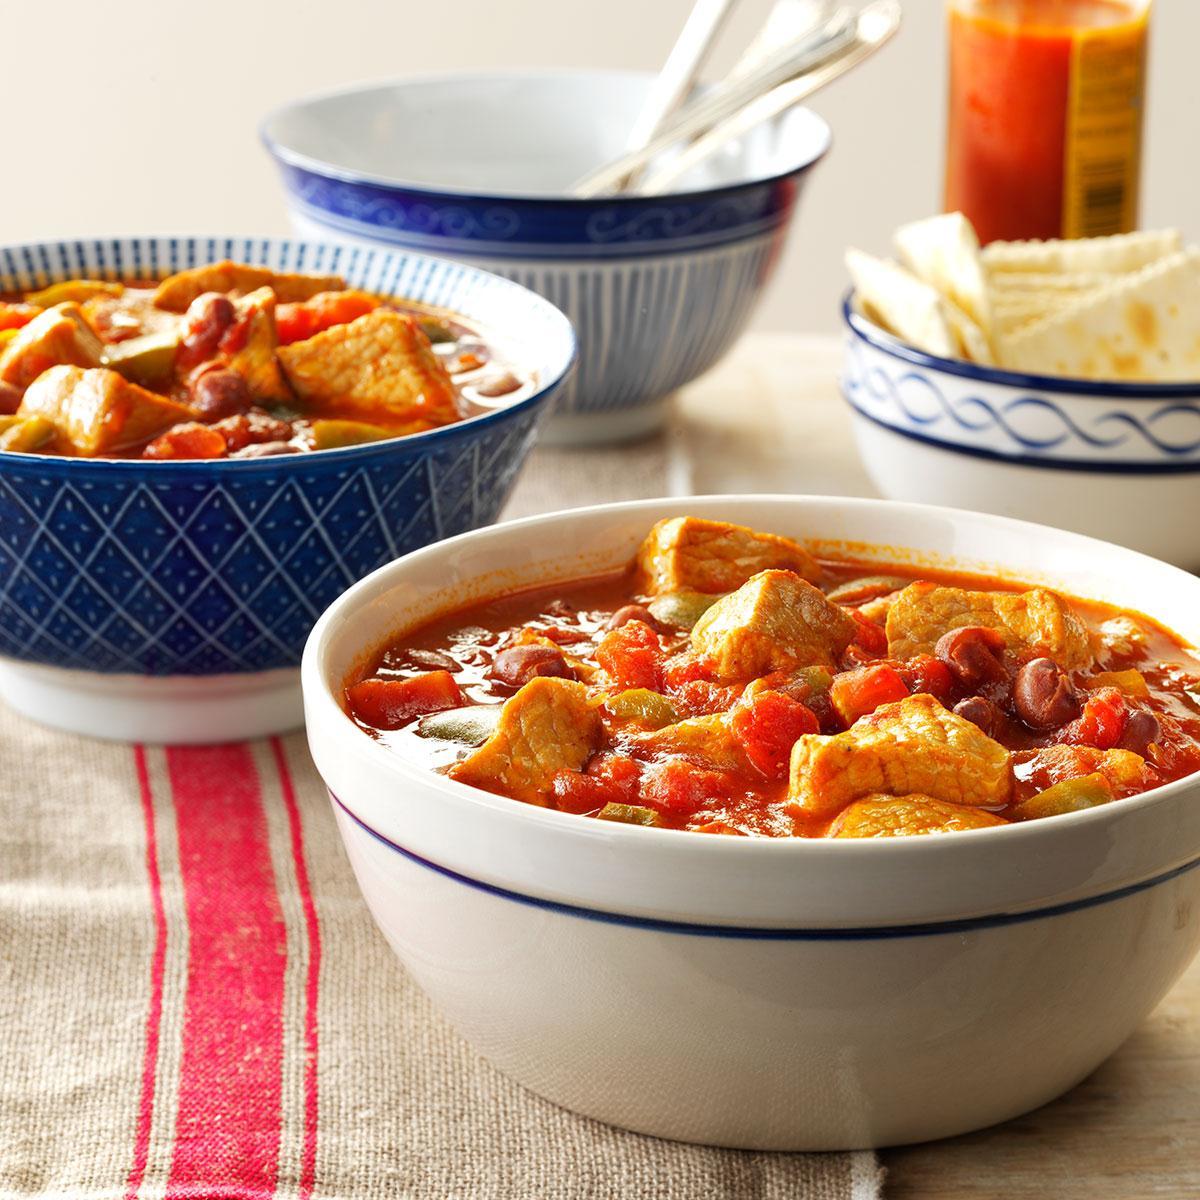 Pork Chili Recipe How To Make It Taste Of Home